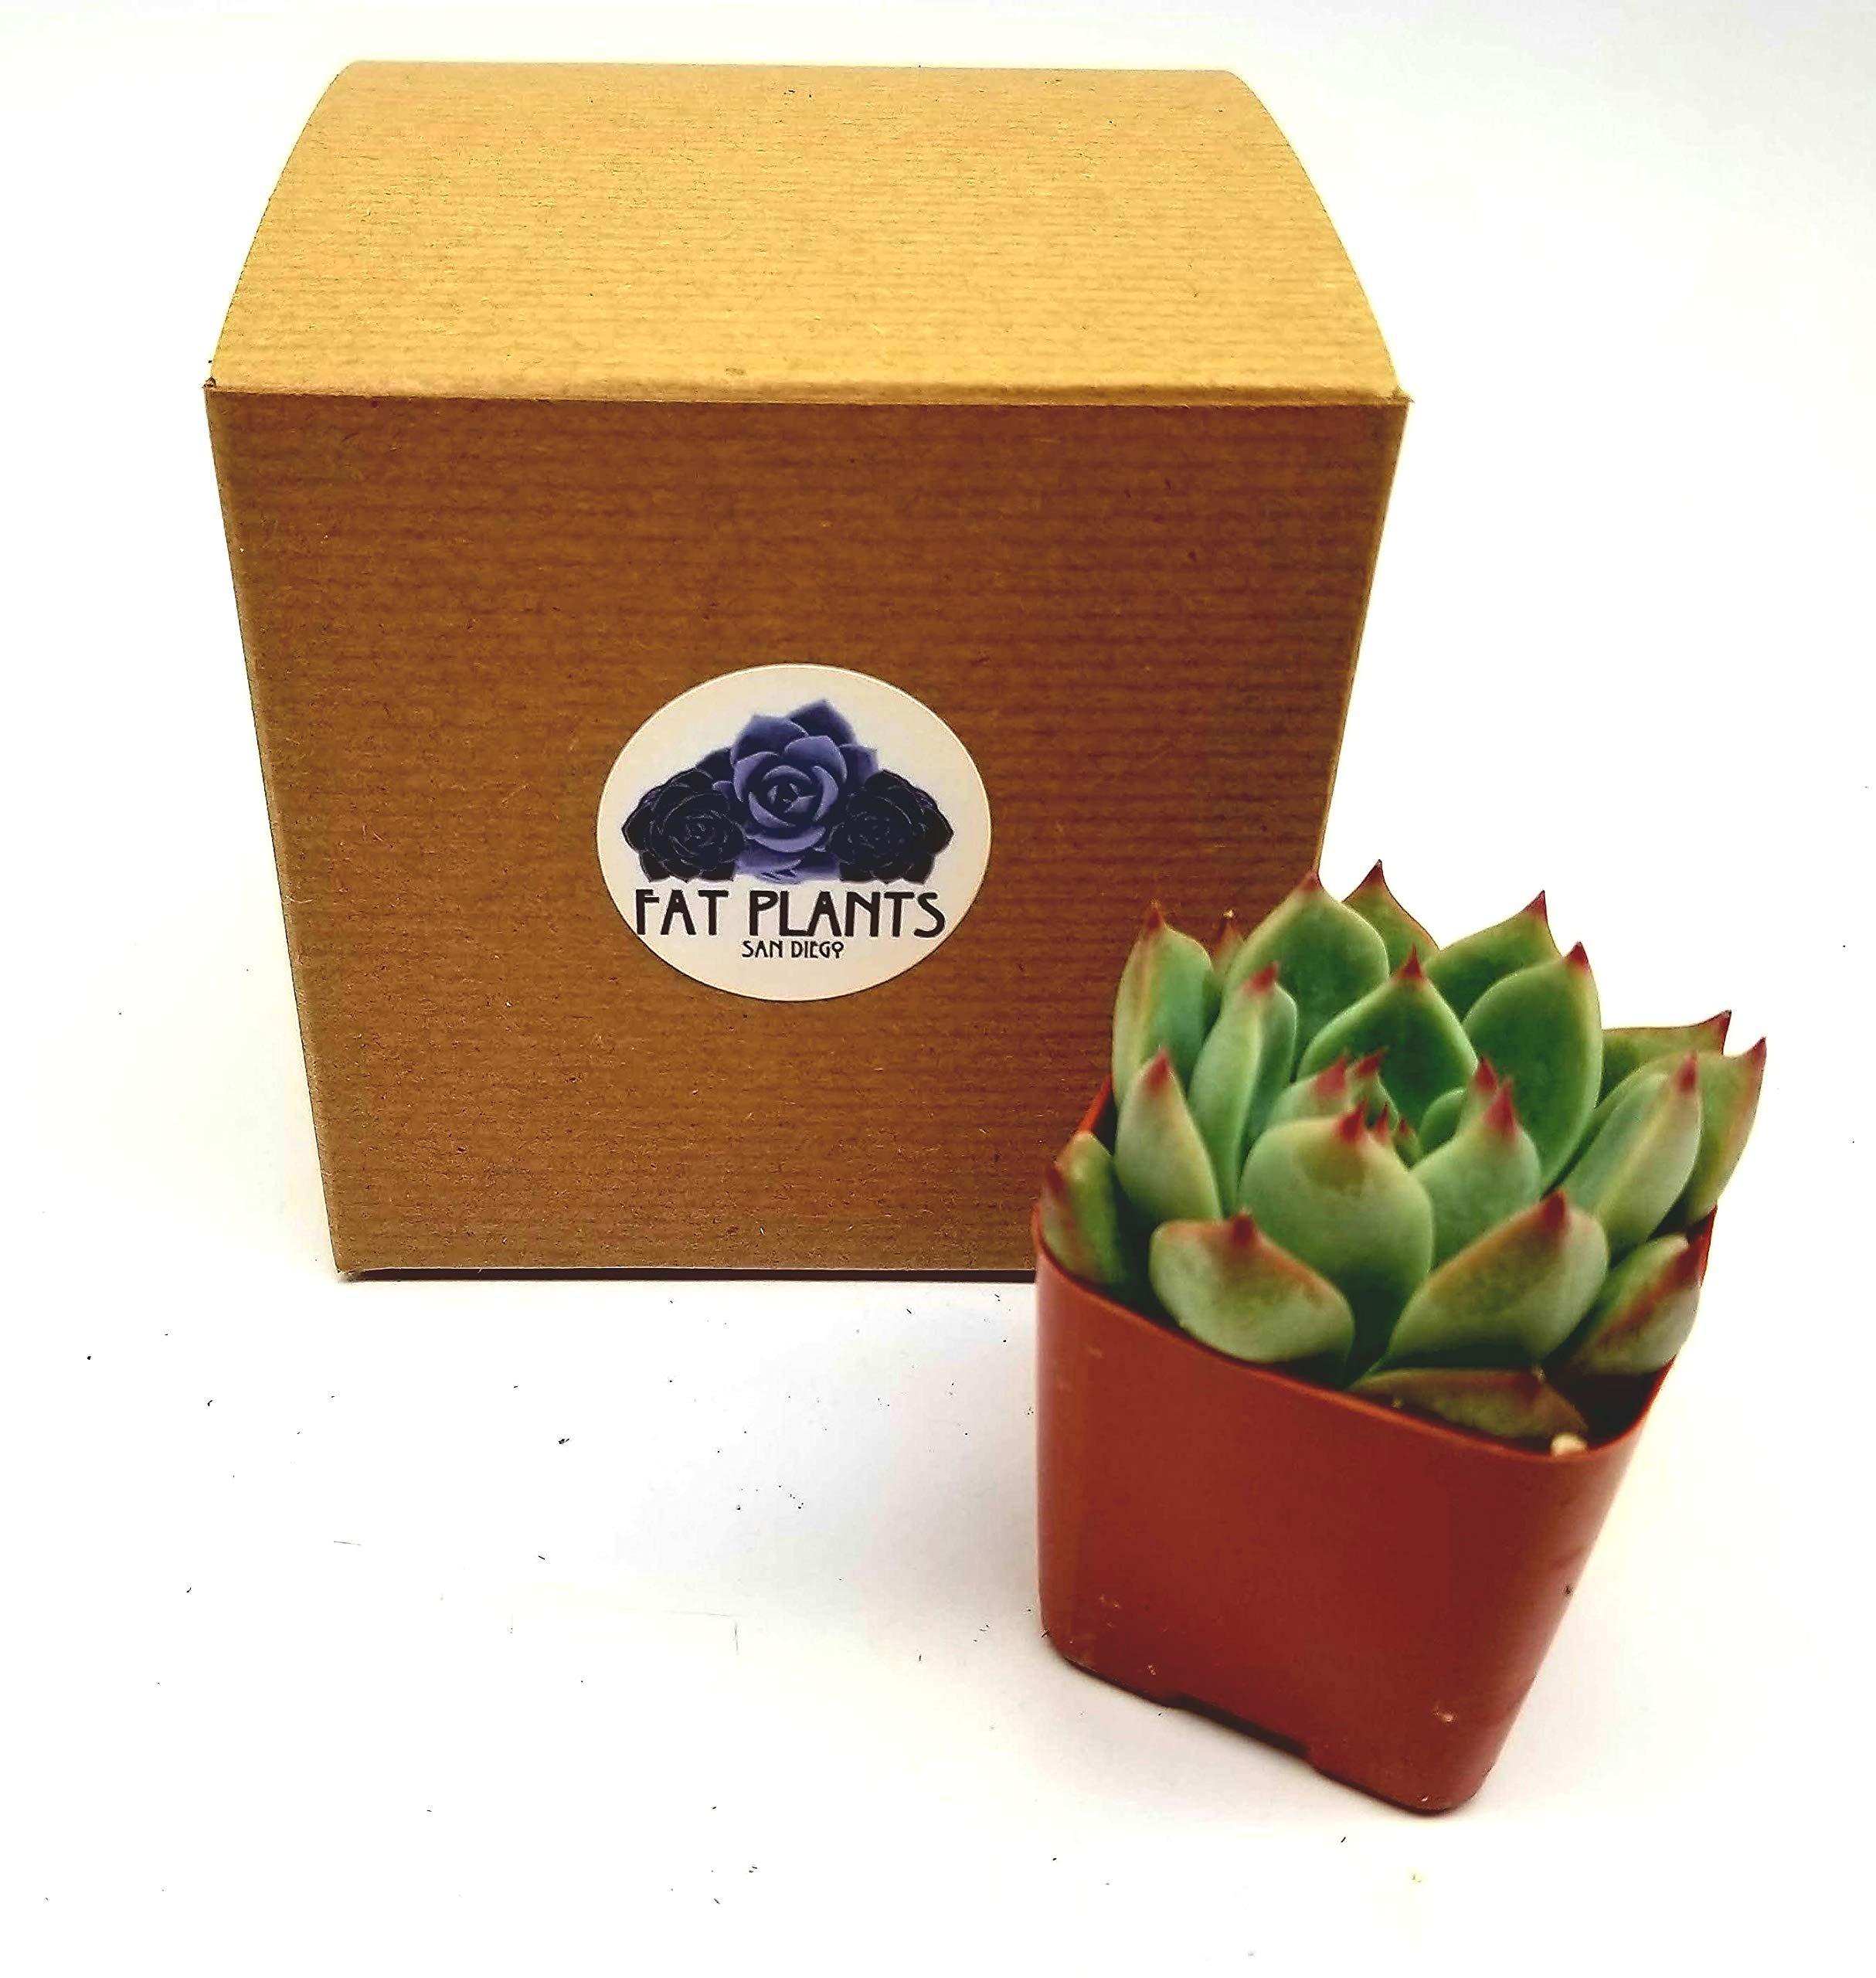 Fat Plants San Diego All Rosette Succulent Plants in 2 Inch Pots (4)